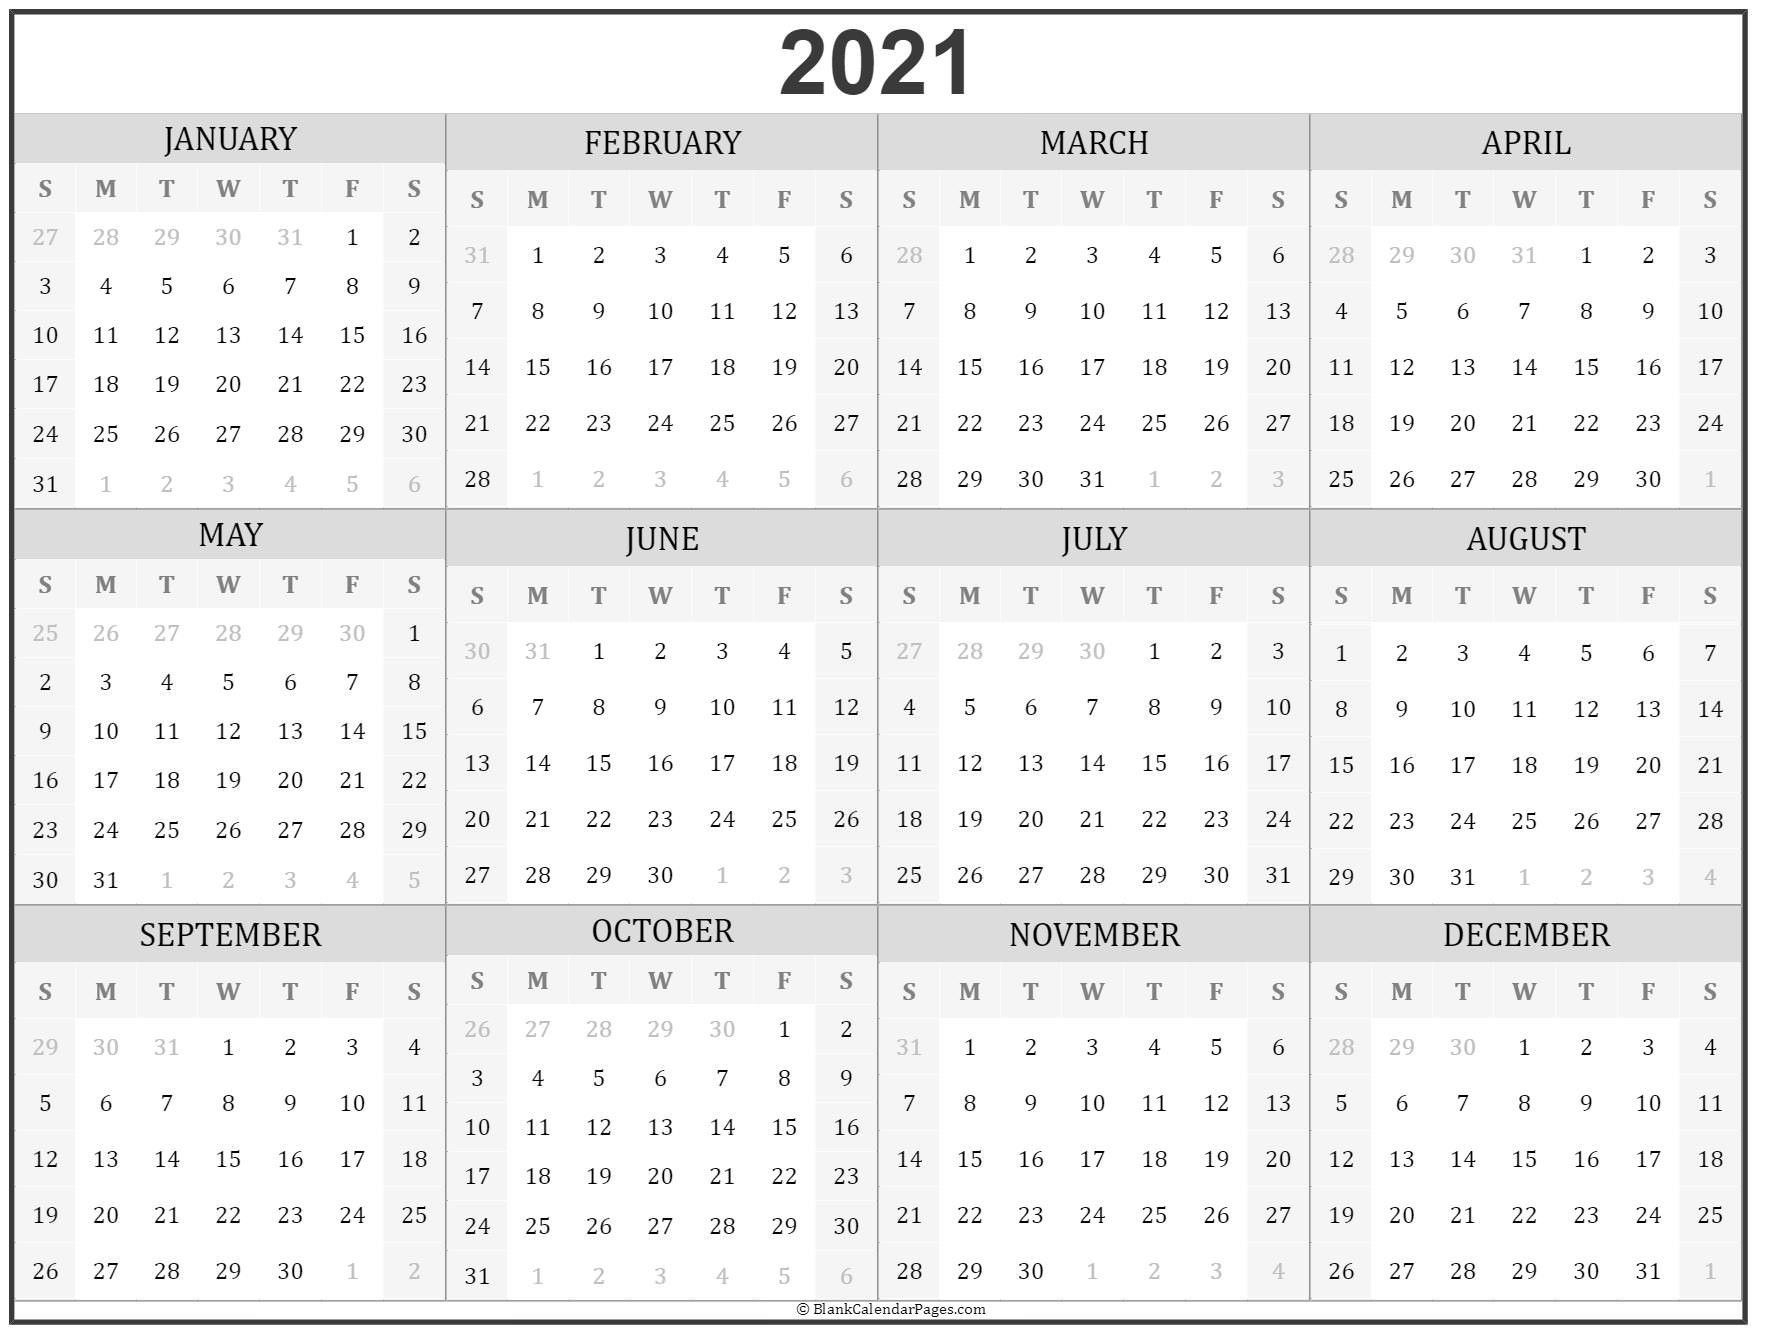 2021 Year Calendar In 2020 | Printable Calendar Design  Free Printable Bill Pay Calendar 2021